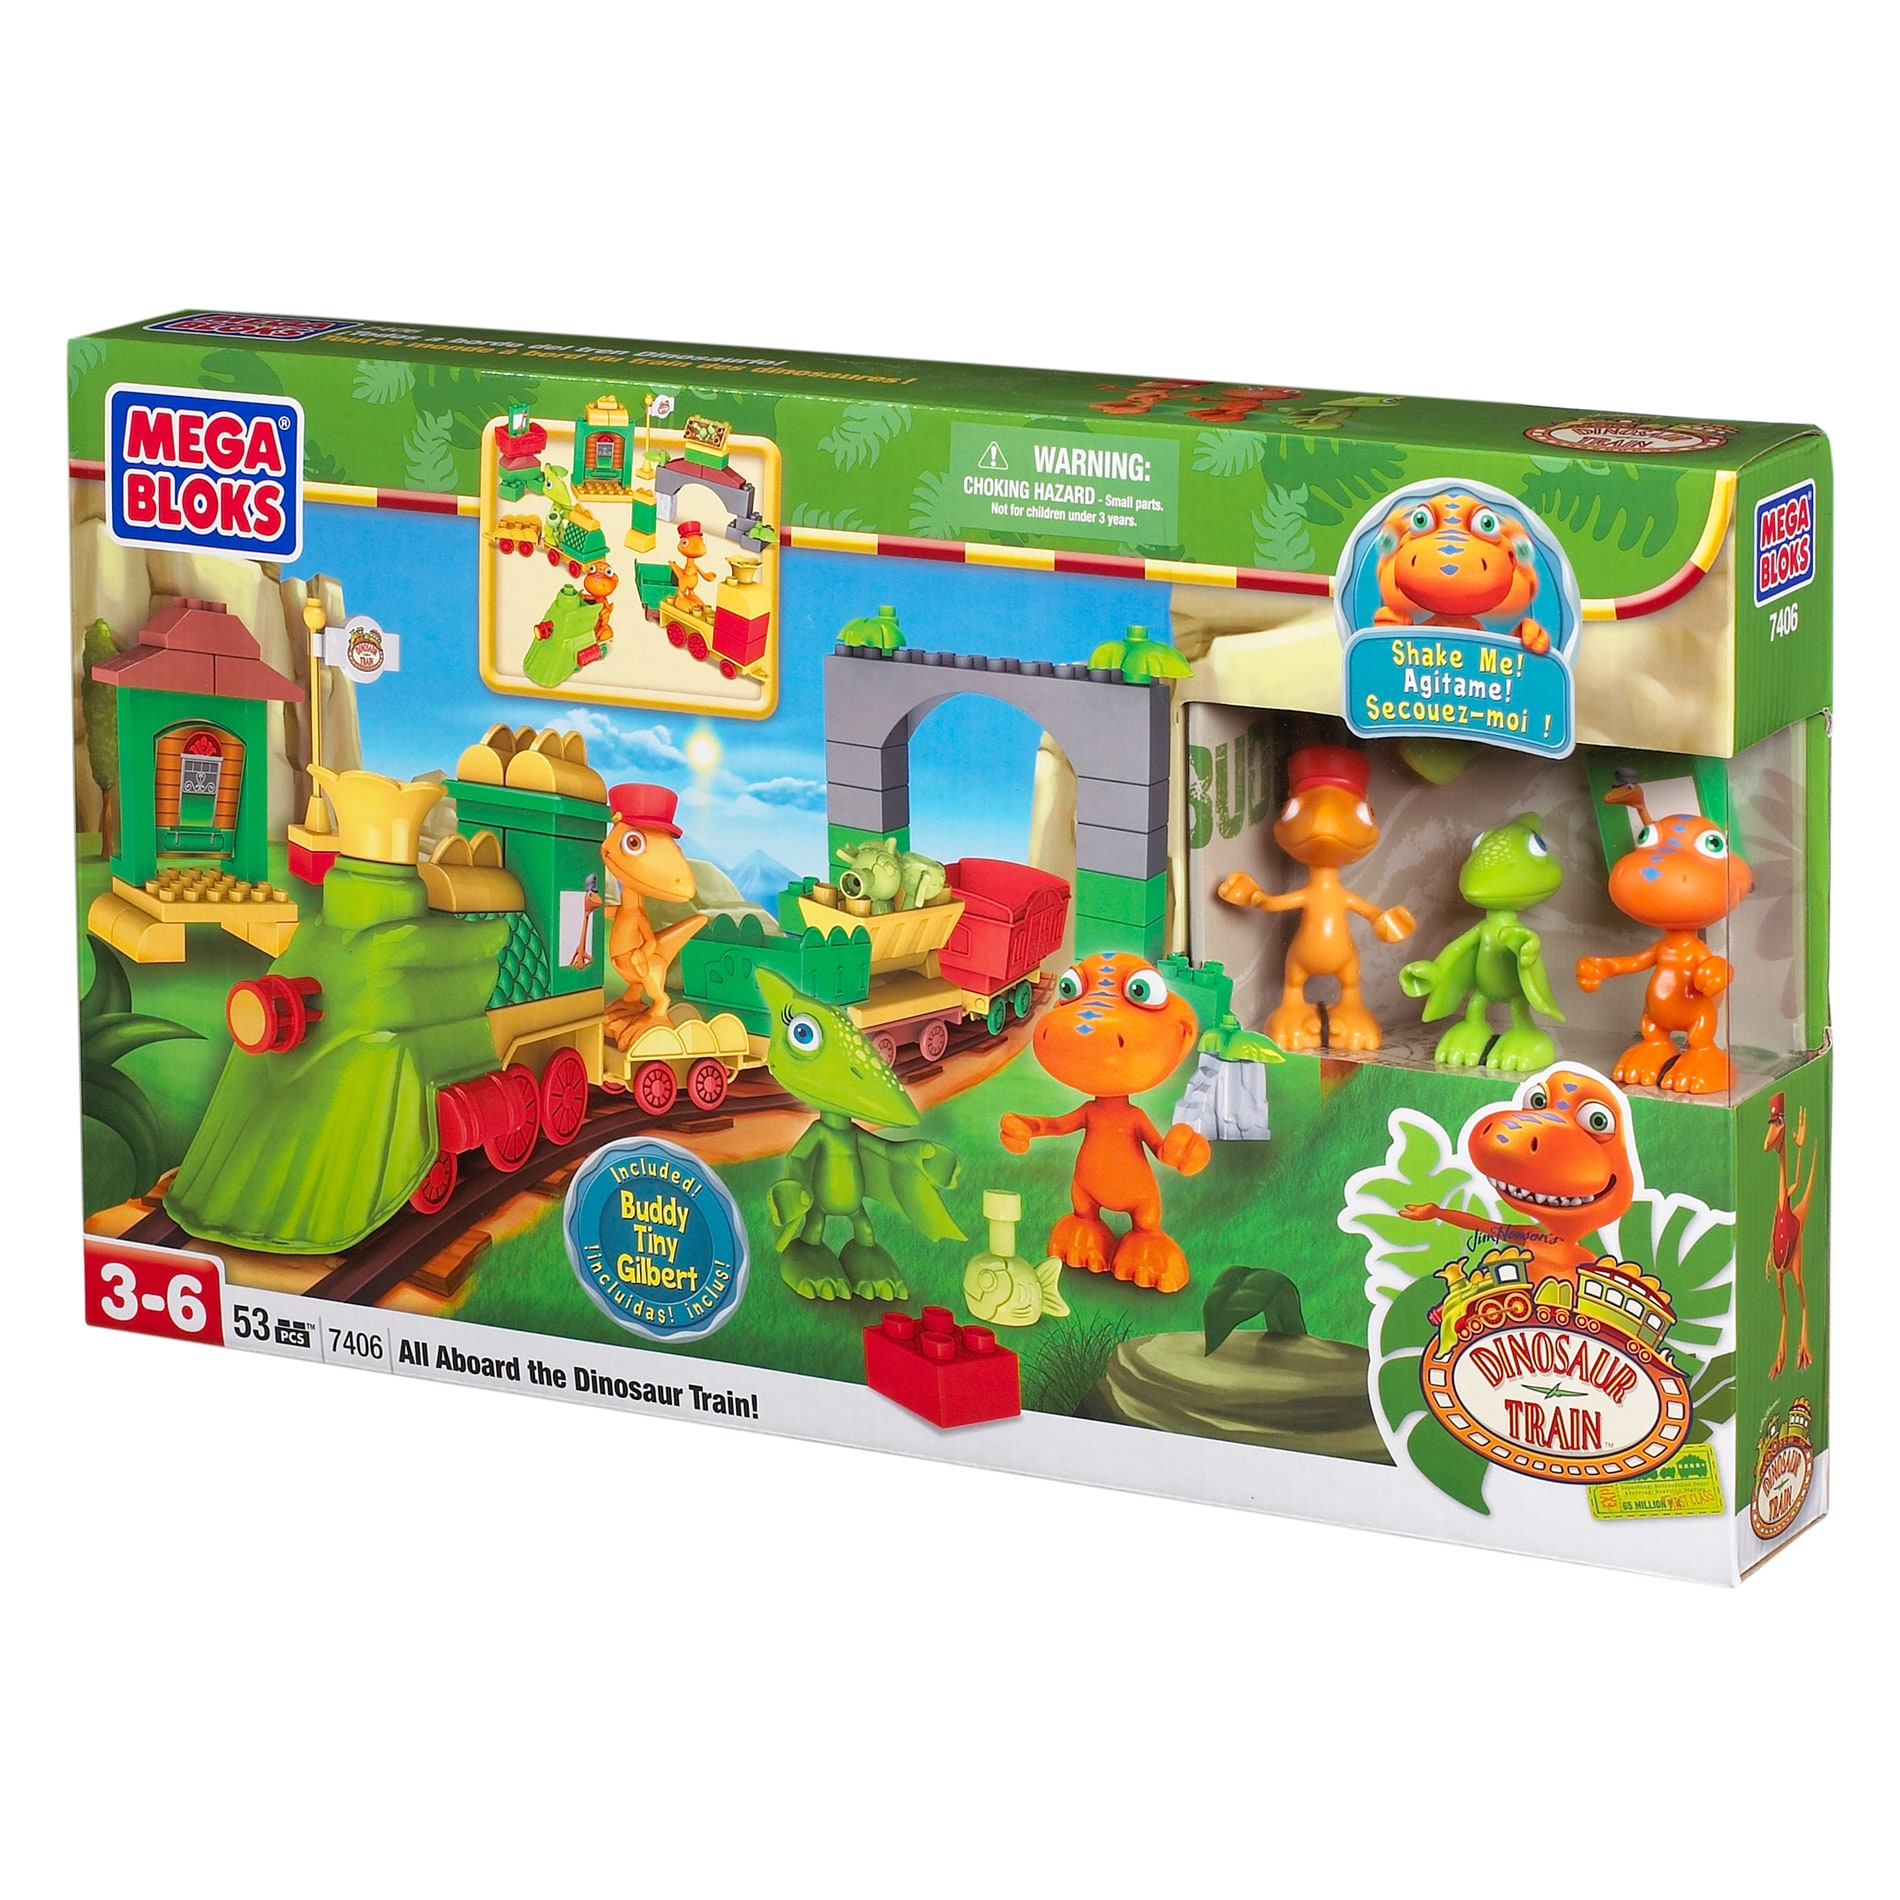 Mega Bloks Dinosaur Train All Aboard the Dinosaur Train Play Set